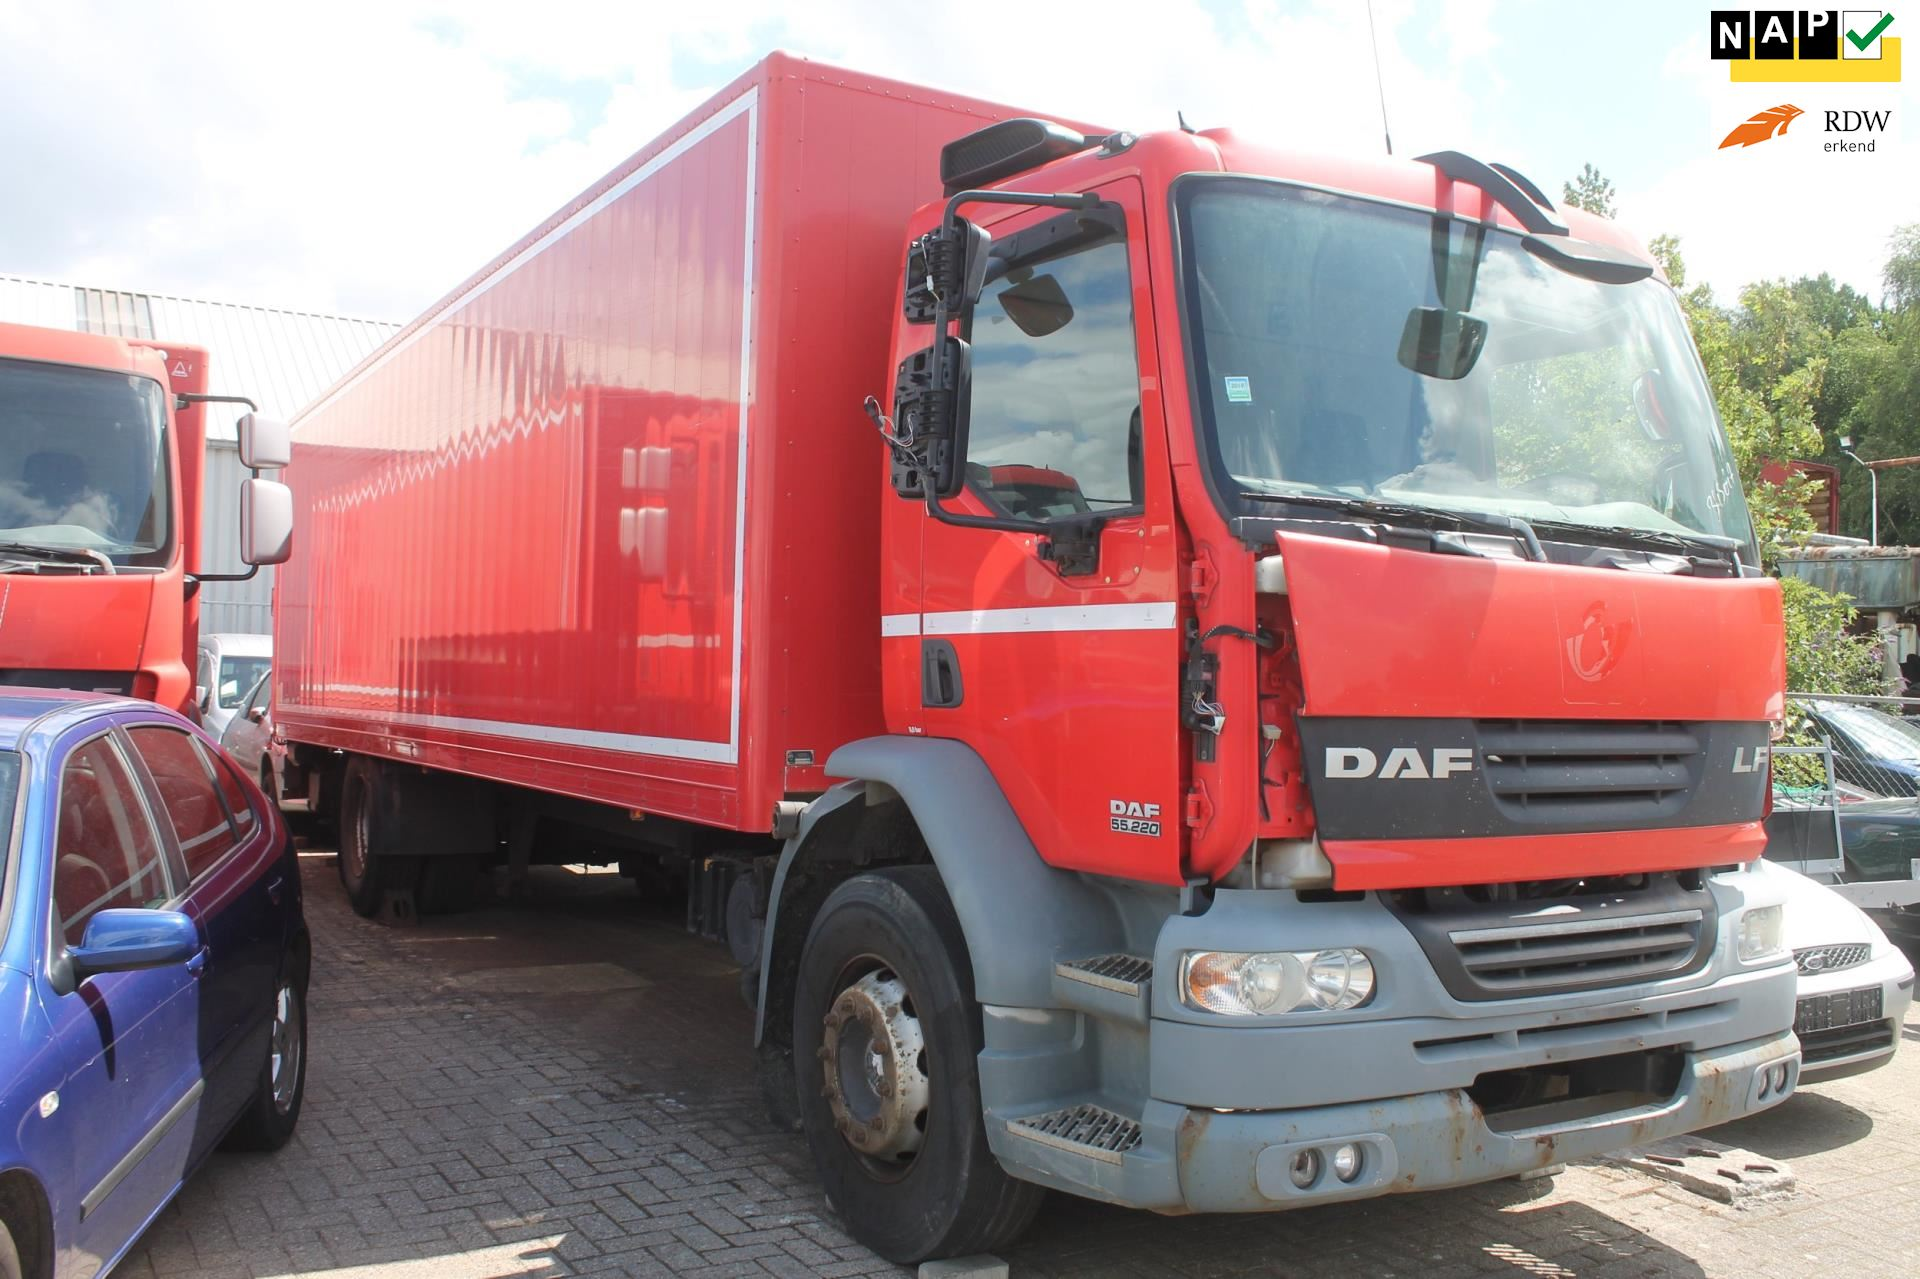 Daf LF 55 18 220 occasion - Autobedrijf Otto VOF